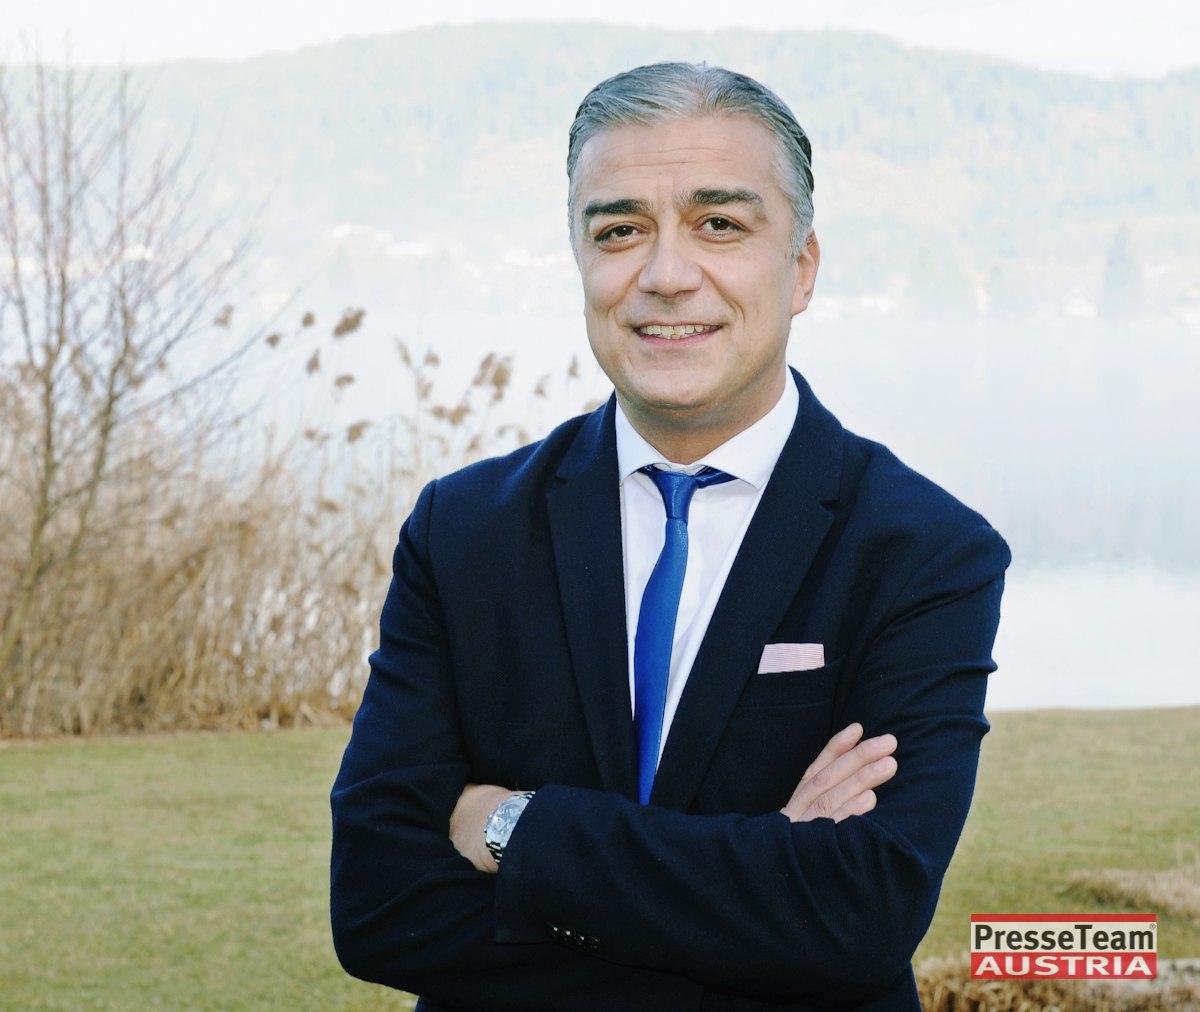 VIVAMAYR Geschäftsführer VIVAMAYR Serhan Güven - VIVAMAYR baut neue Klinik in Maria Wörth